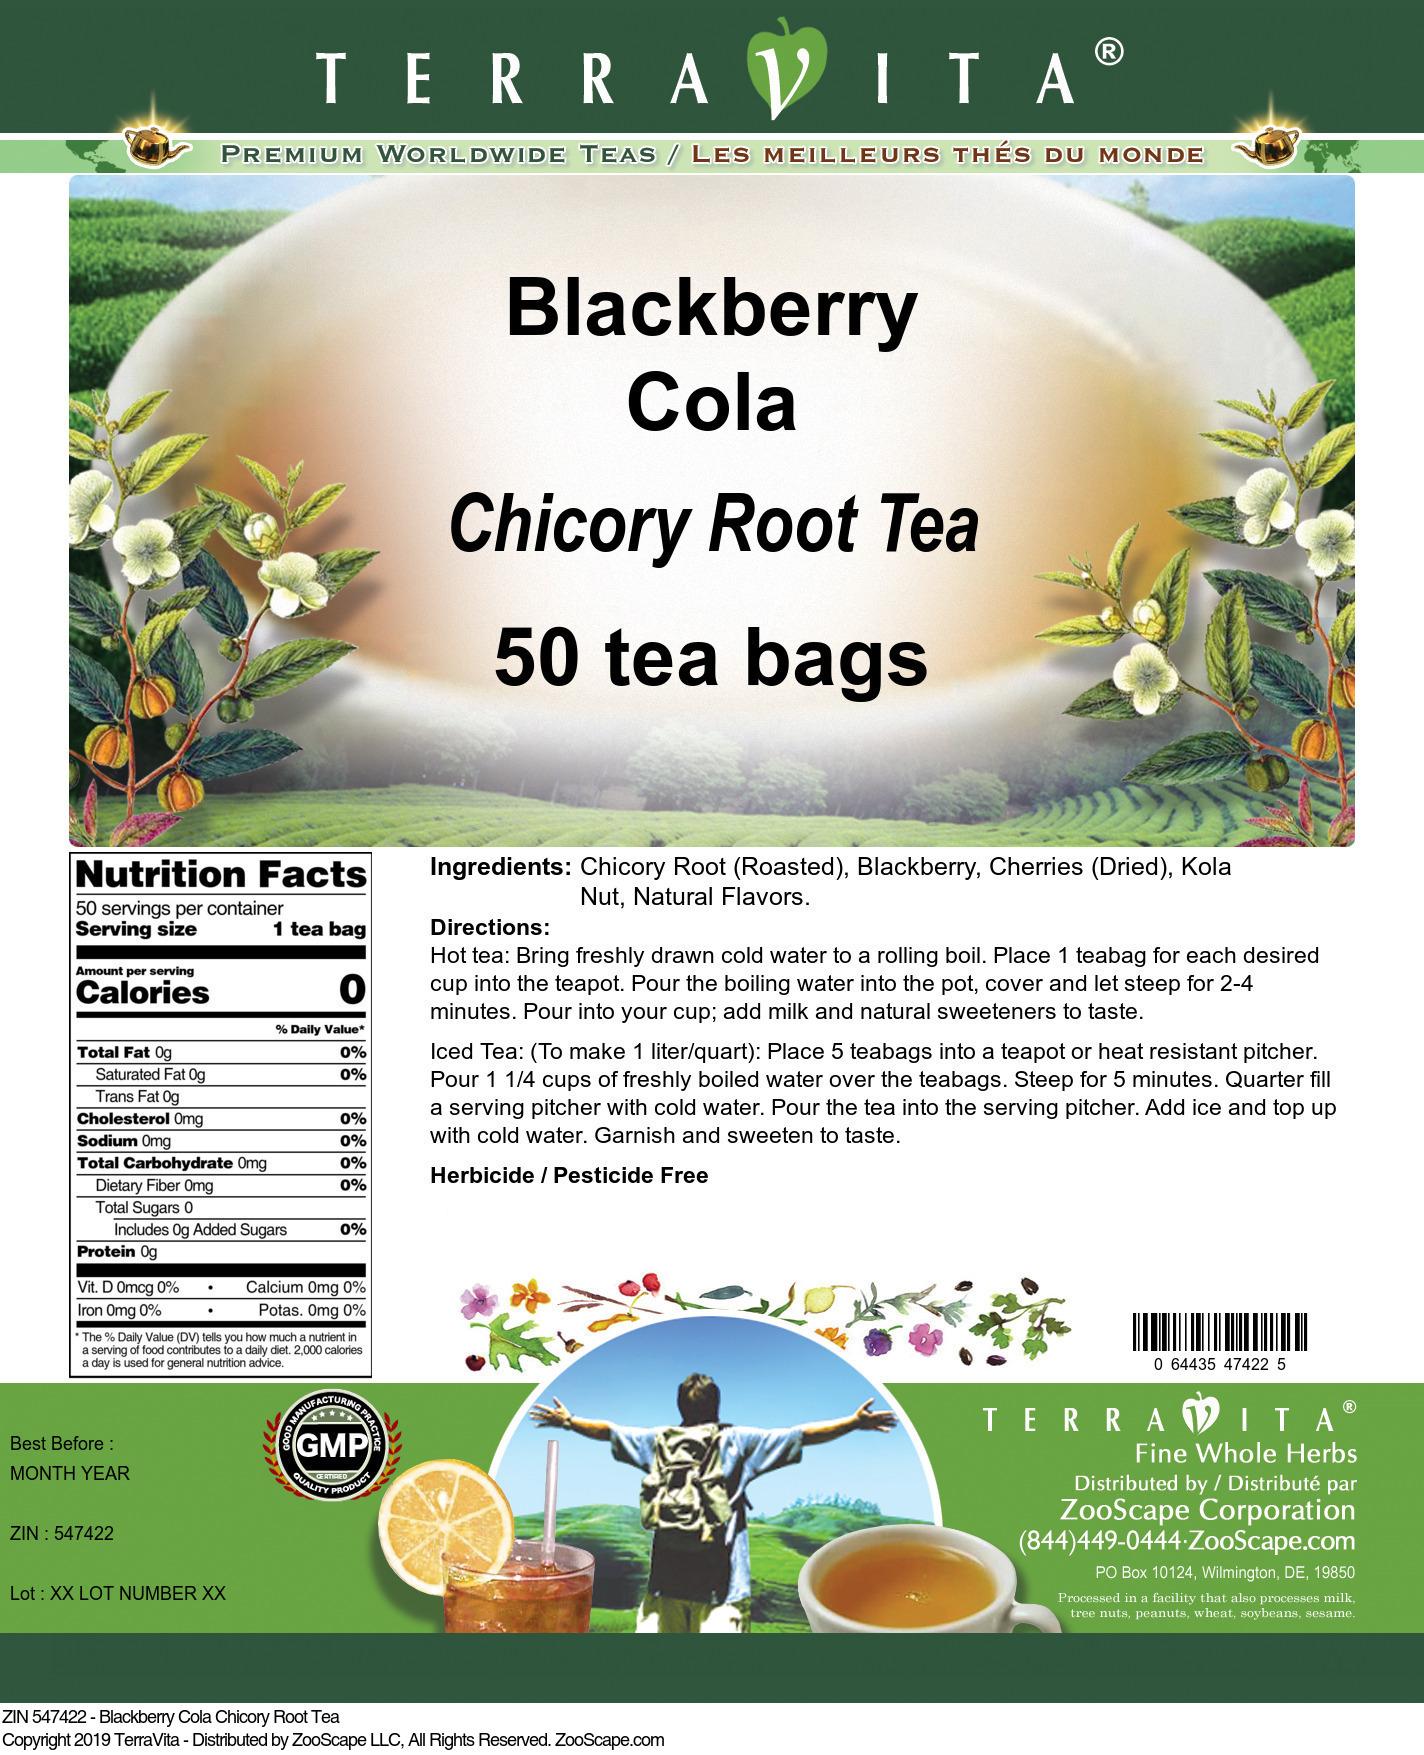 Blackberry Cola Chicory Root